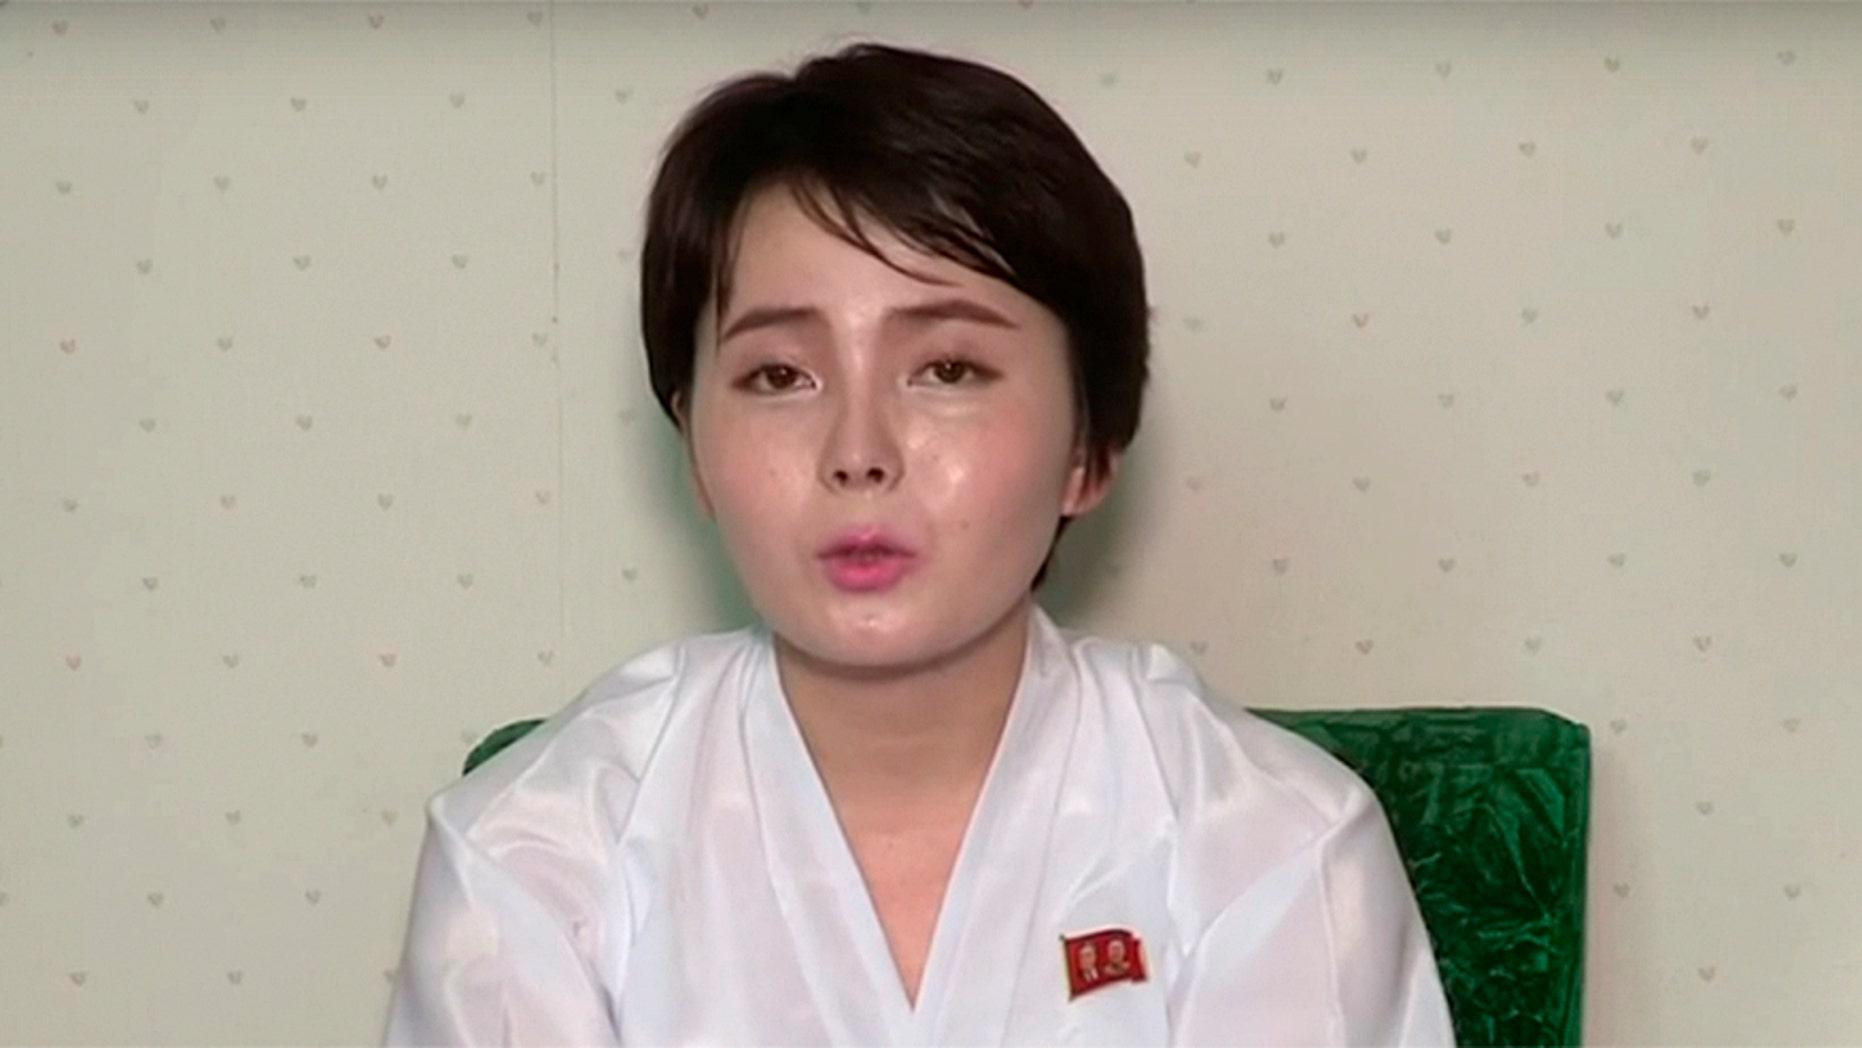 Lim Ji-hyun, 26, appeared in the video posted on YouTube this week. (Uriminzokkiri/YouTube)